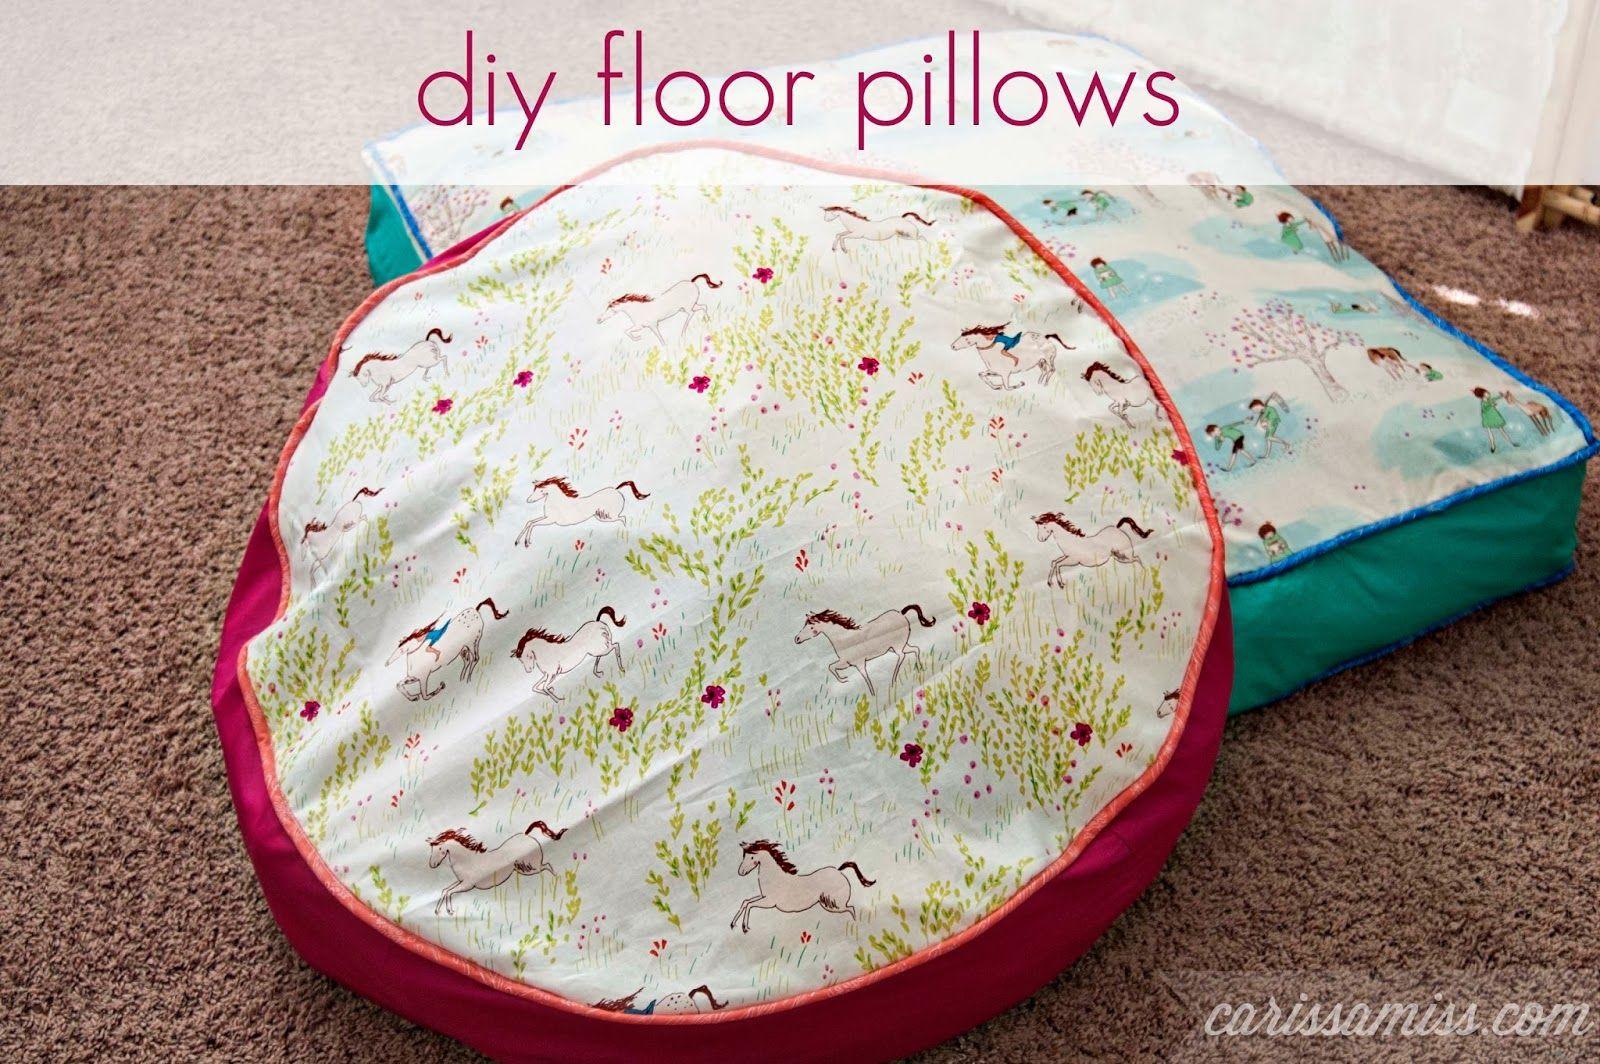 Diy floor pillows floor pillows pillows and crafty